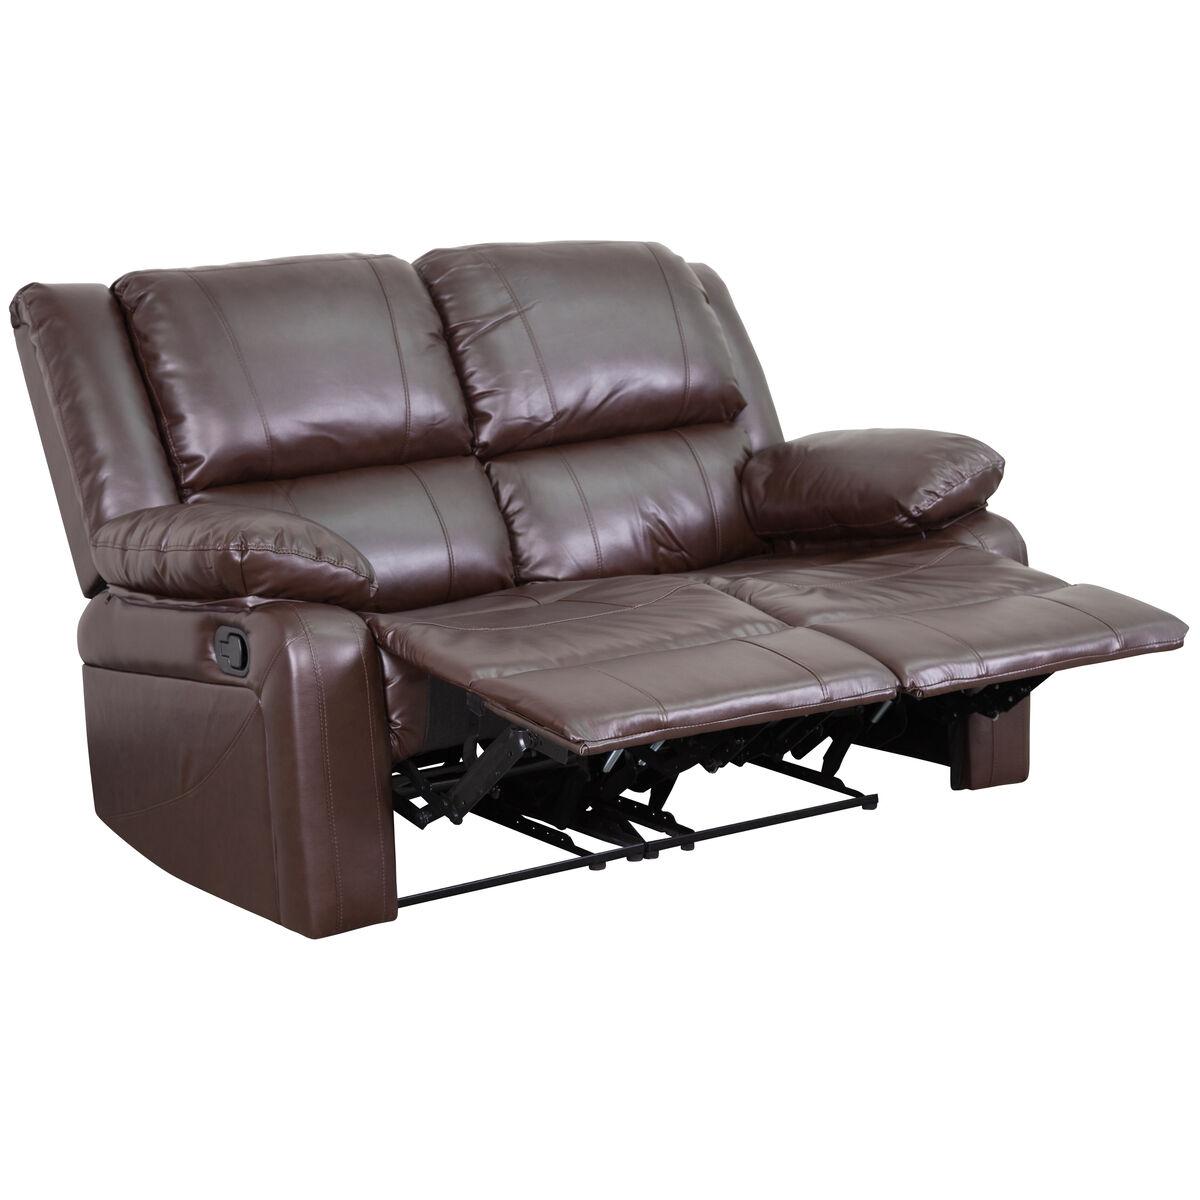 Cool Harmony Series Brown Leather Loveseat With Two Built In Recliners Inzonedesignstudio Interior Chair Design Inzonedesignstudiocom